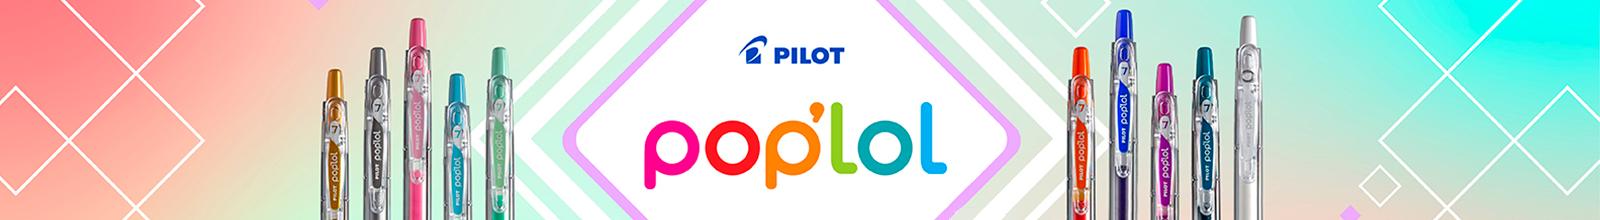 Caneta Poplol Pilot